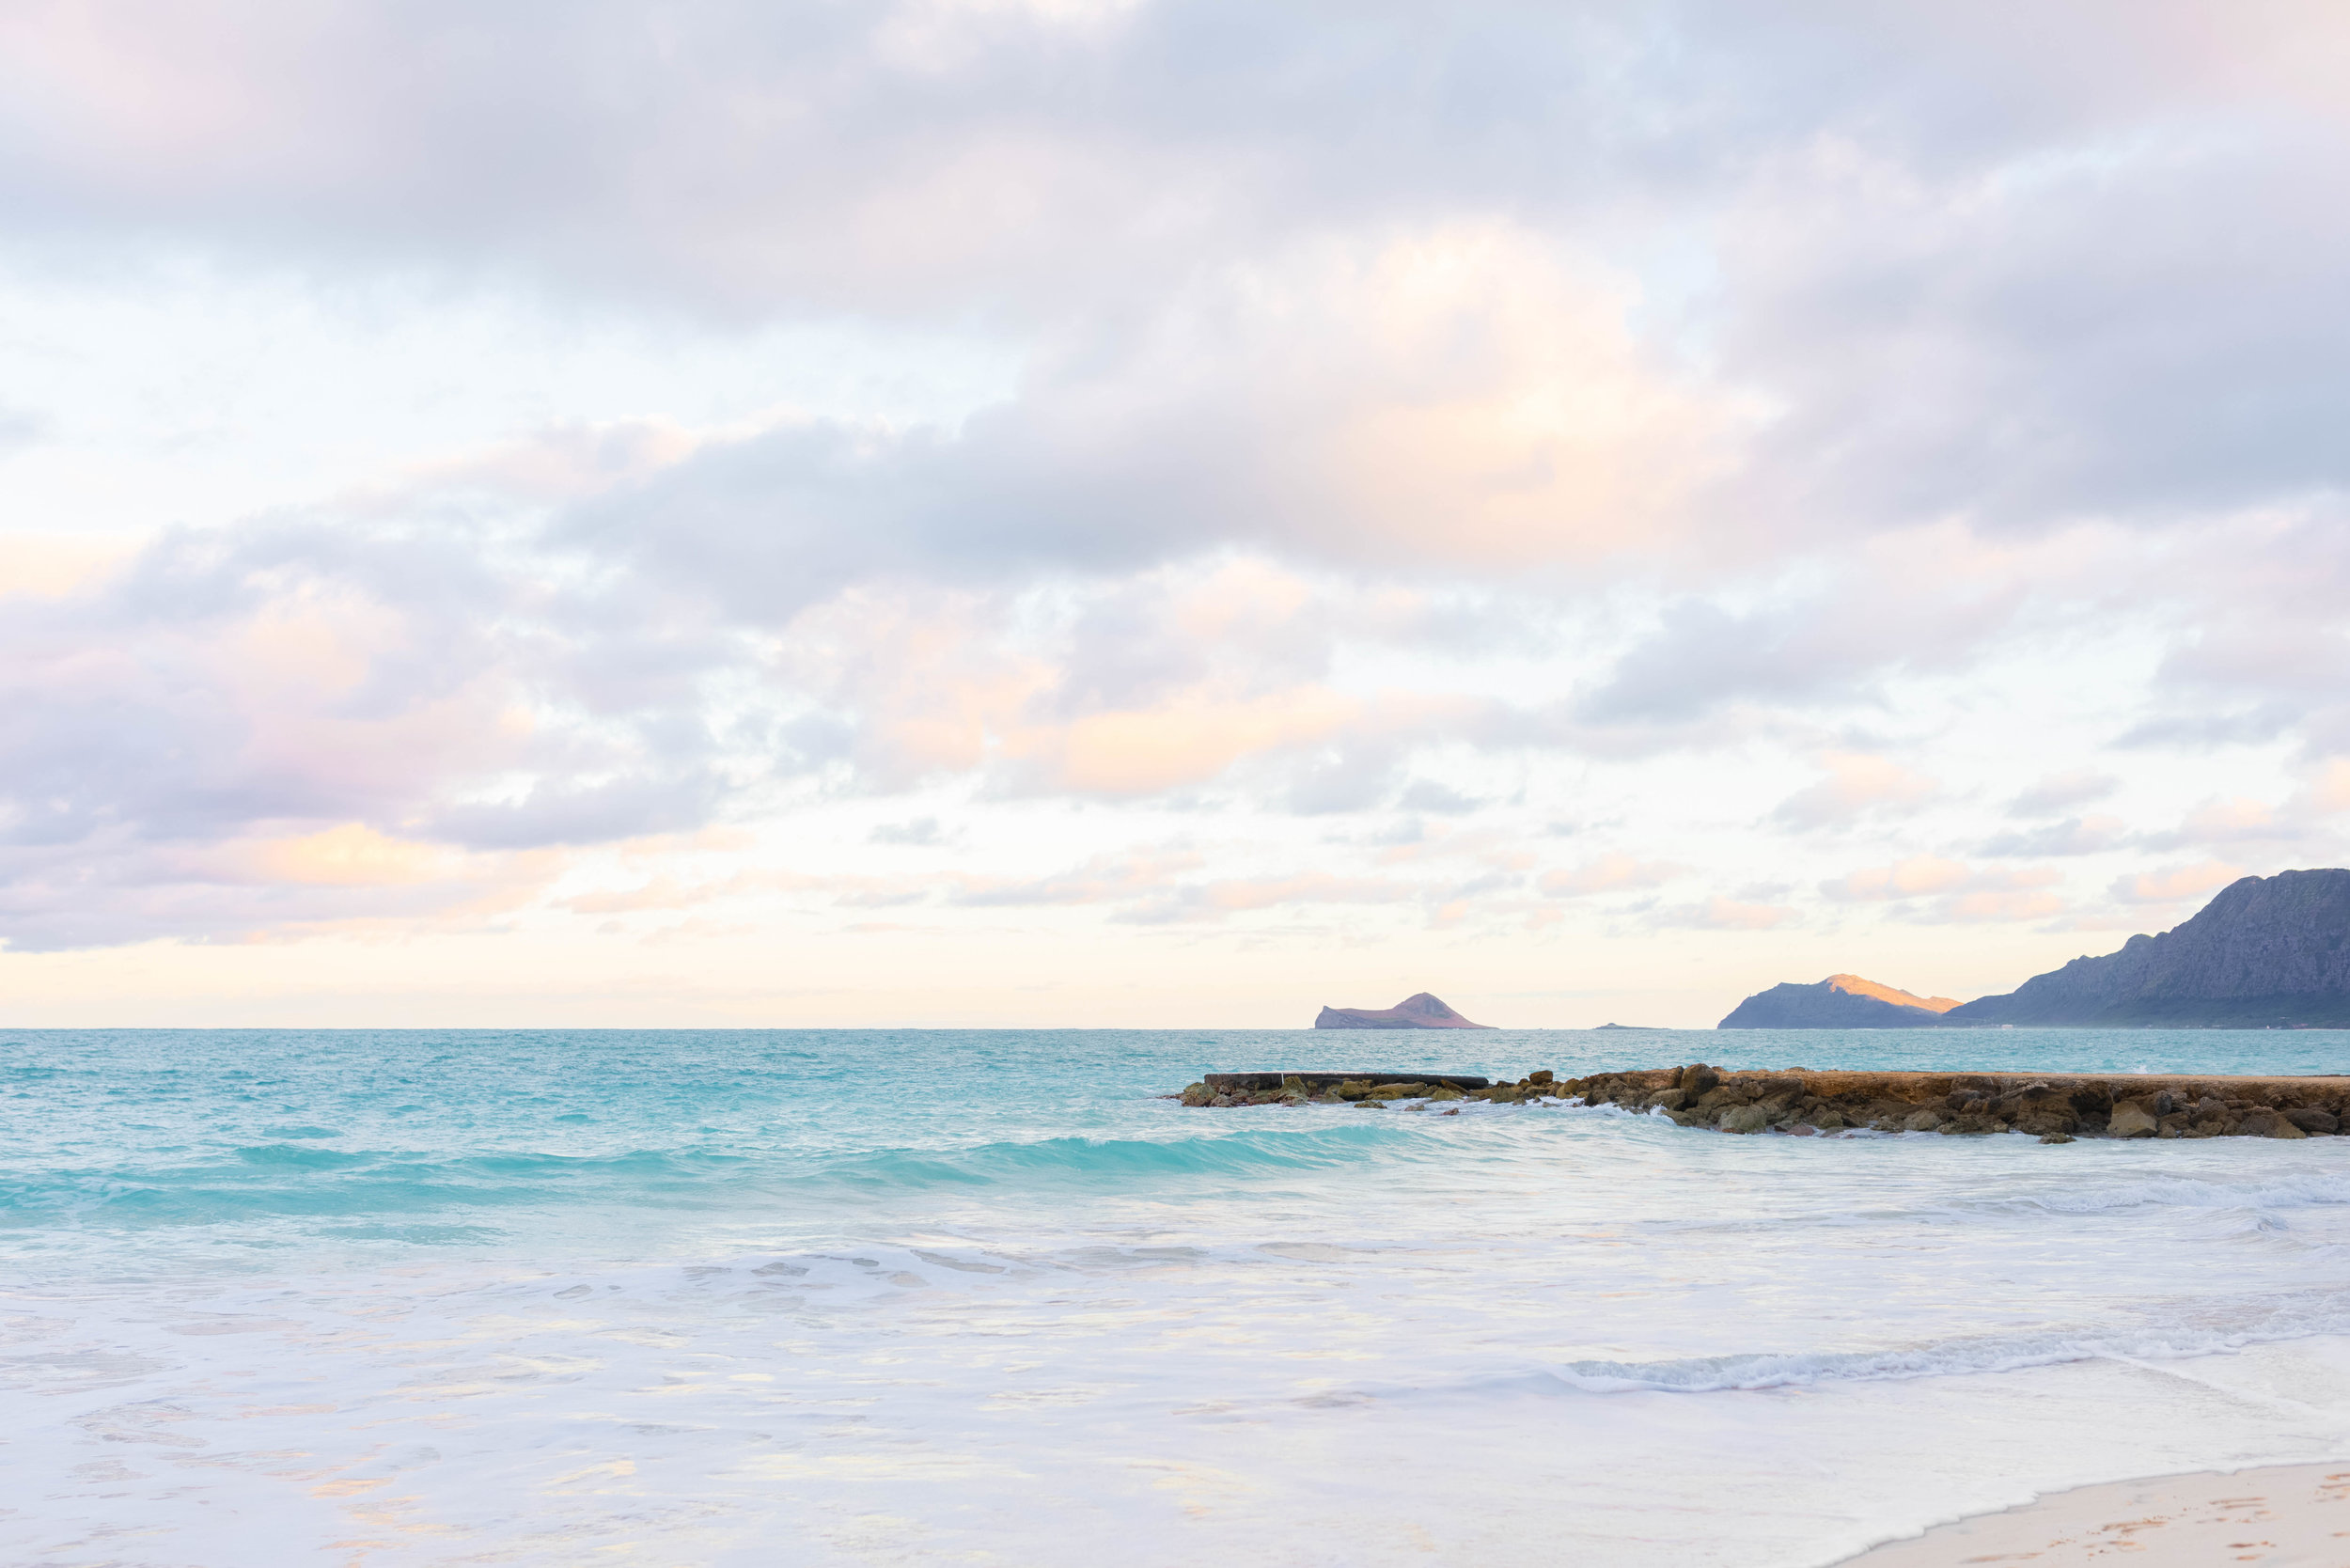 Bellows Beach, Oahu 2015